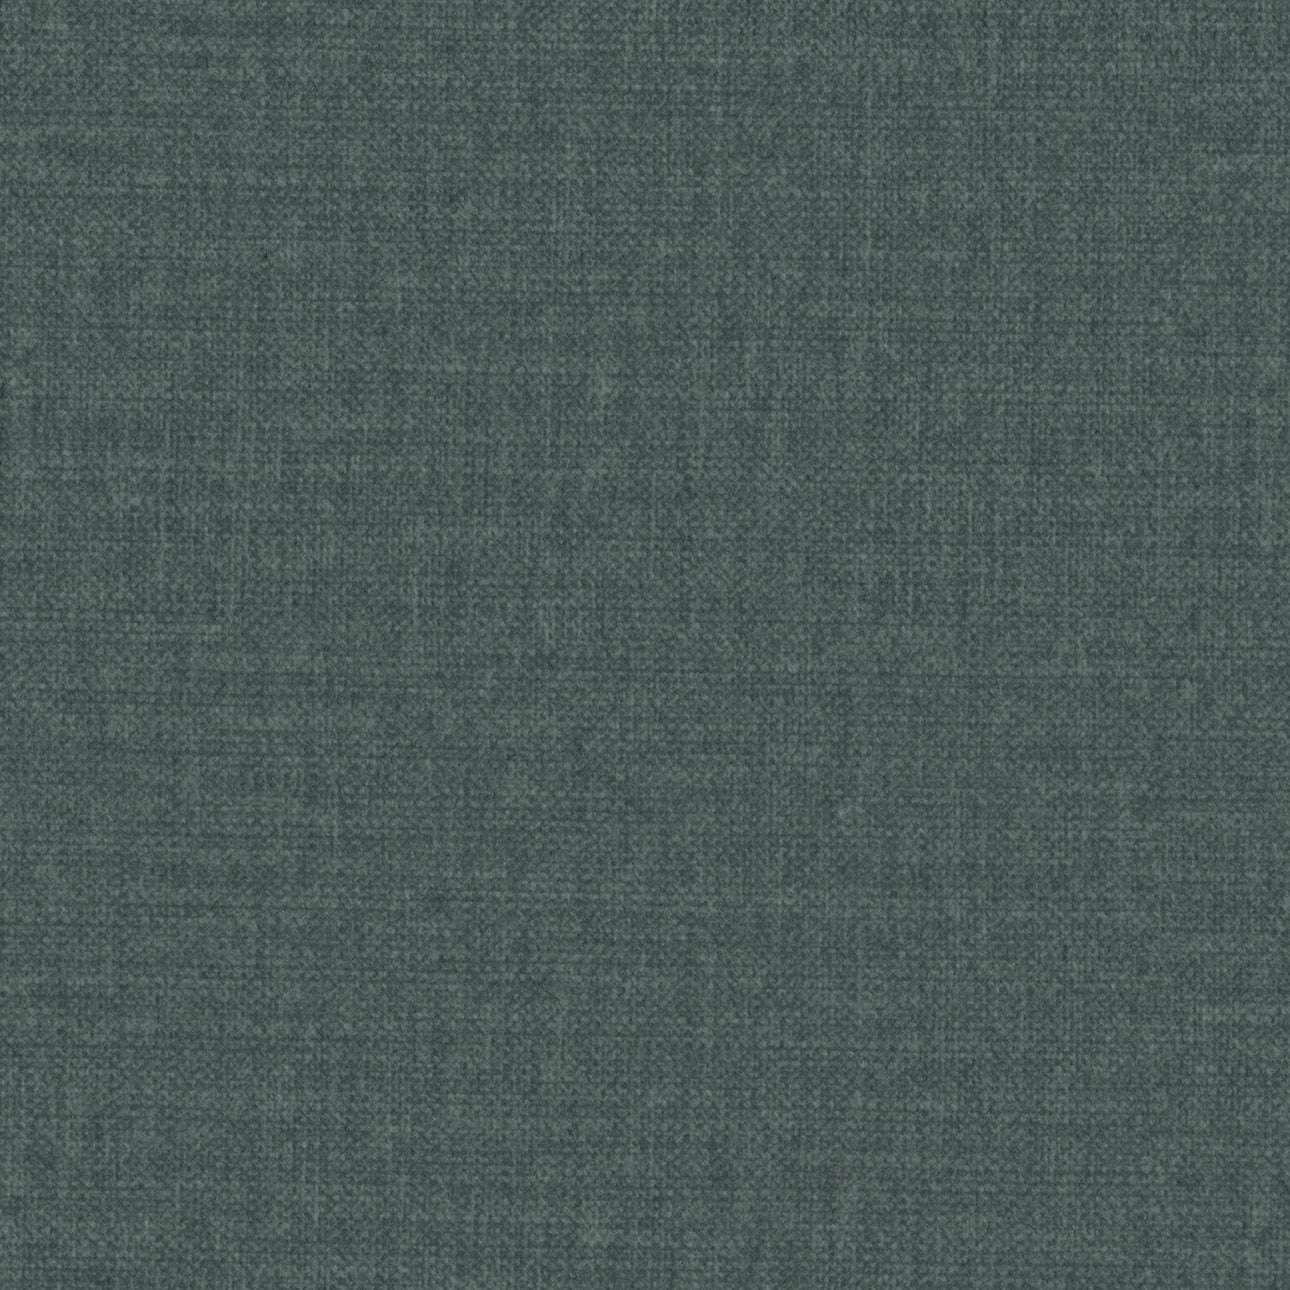 Kivik klädsel<br>Schäslong i kollektionen Ingrid, Tyg: 705-36